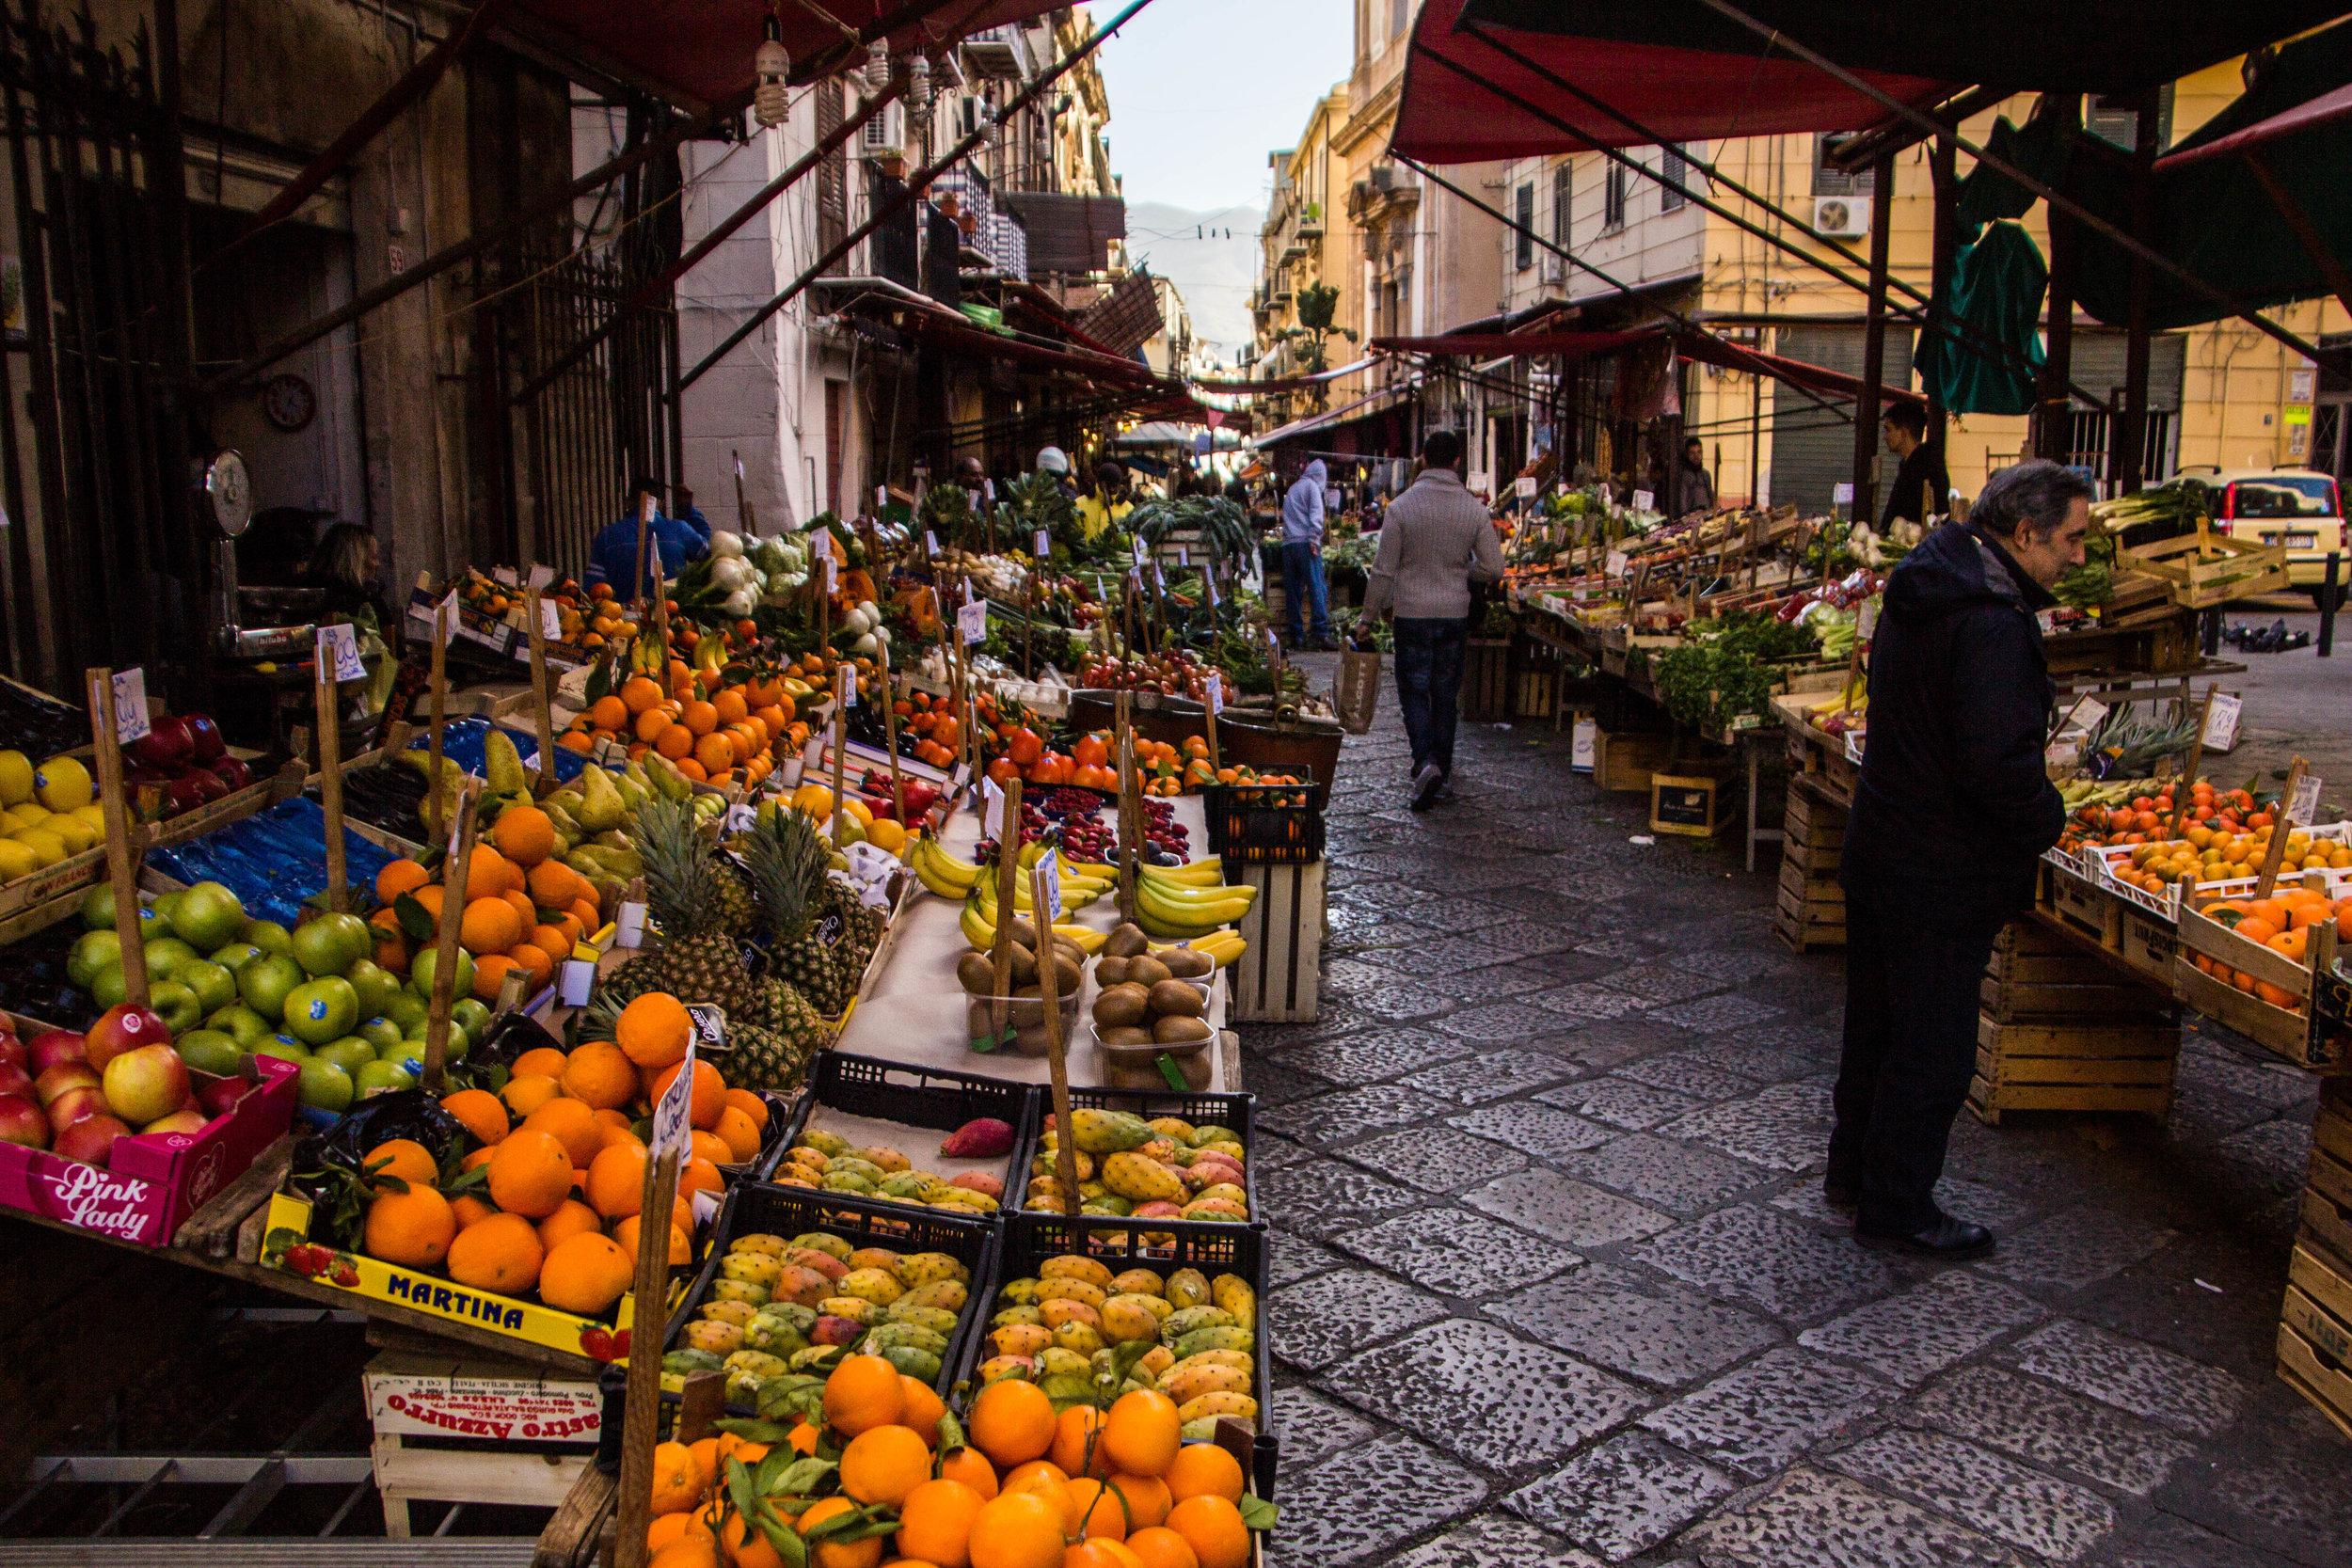 street-markets-palermo-sicily-13.jpg